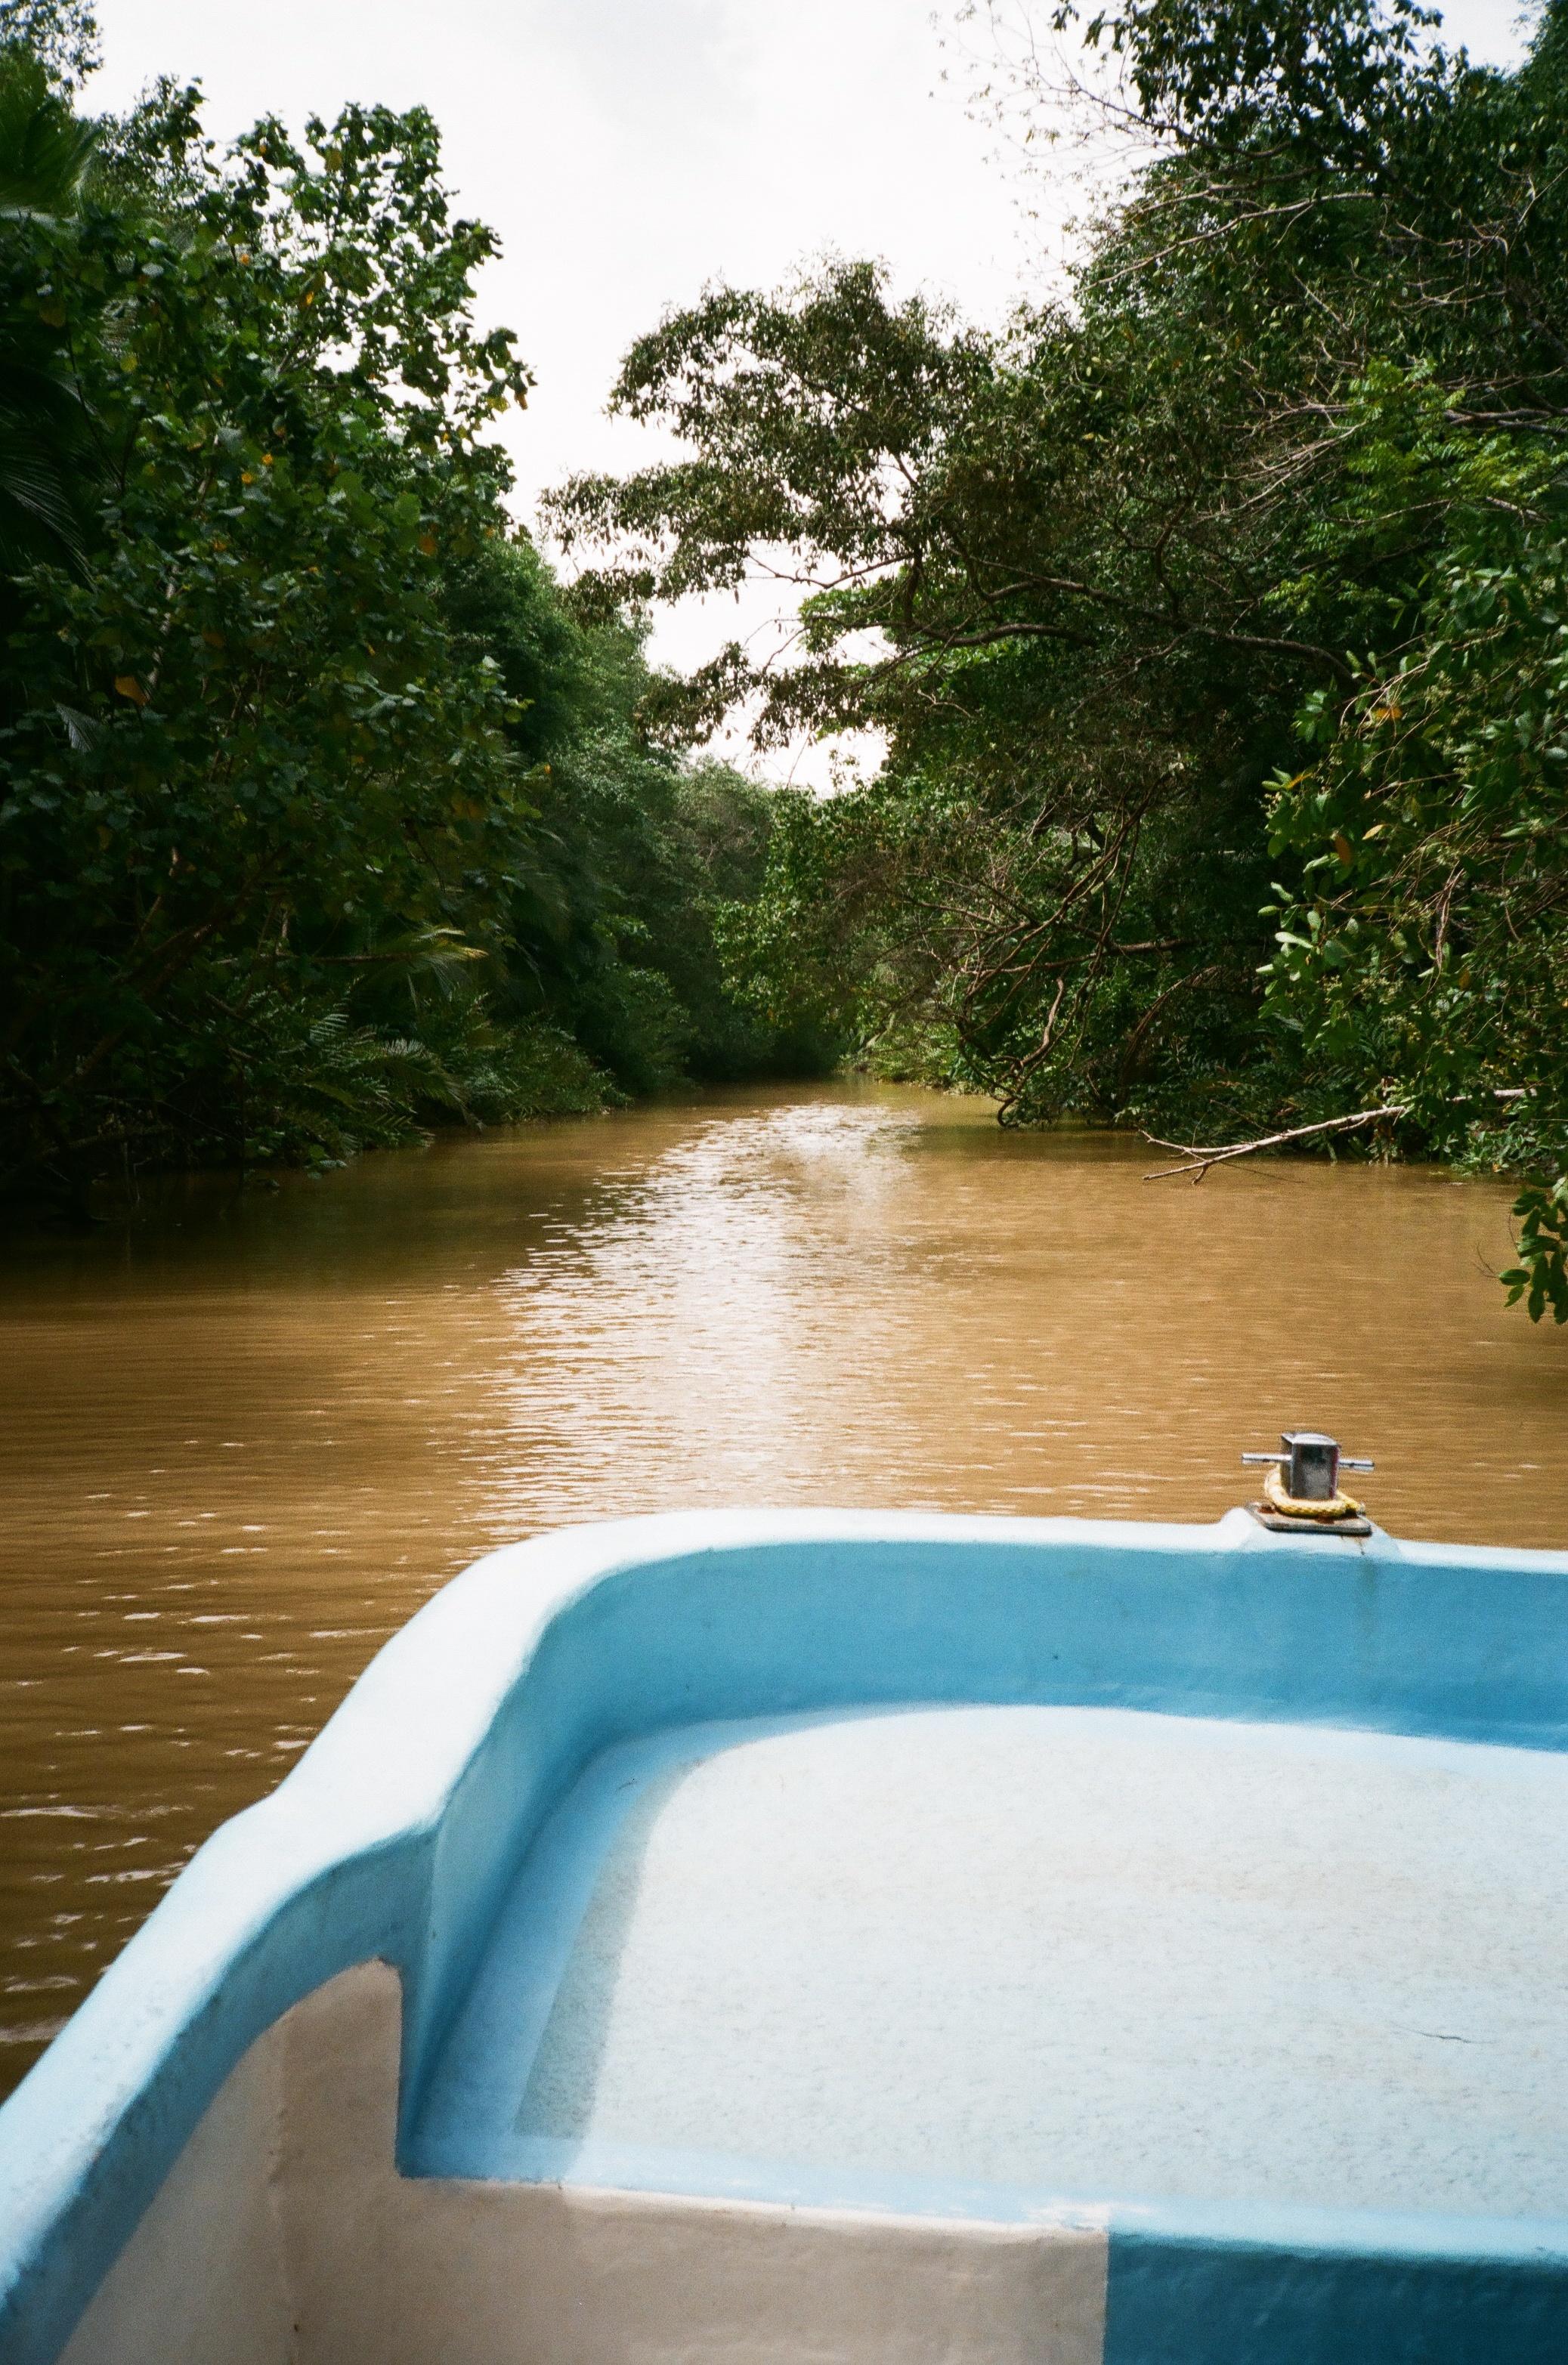 Rio Cotos, Puntarenas Province, Costa Rica